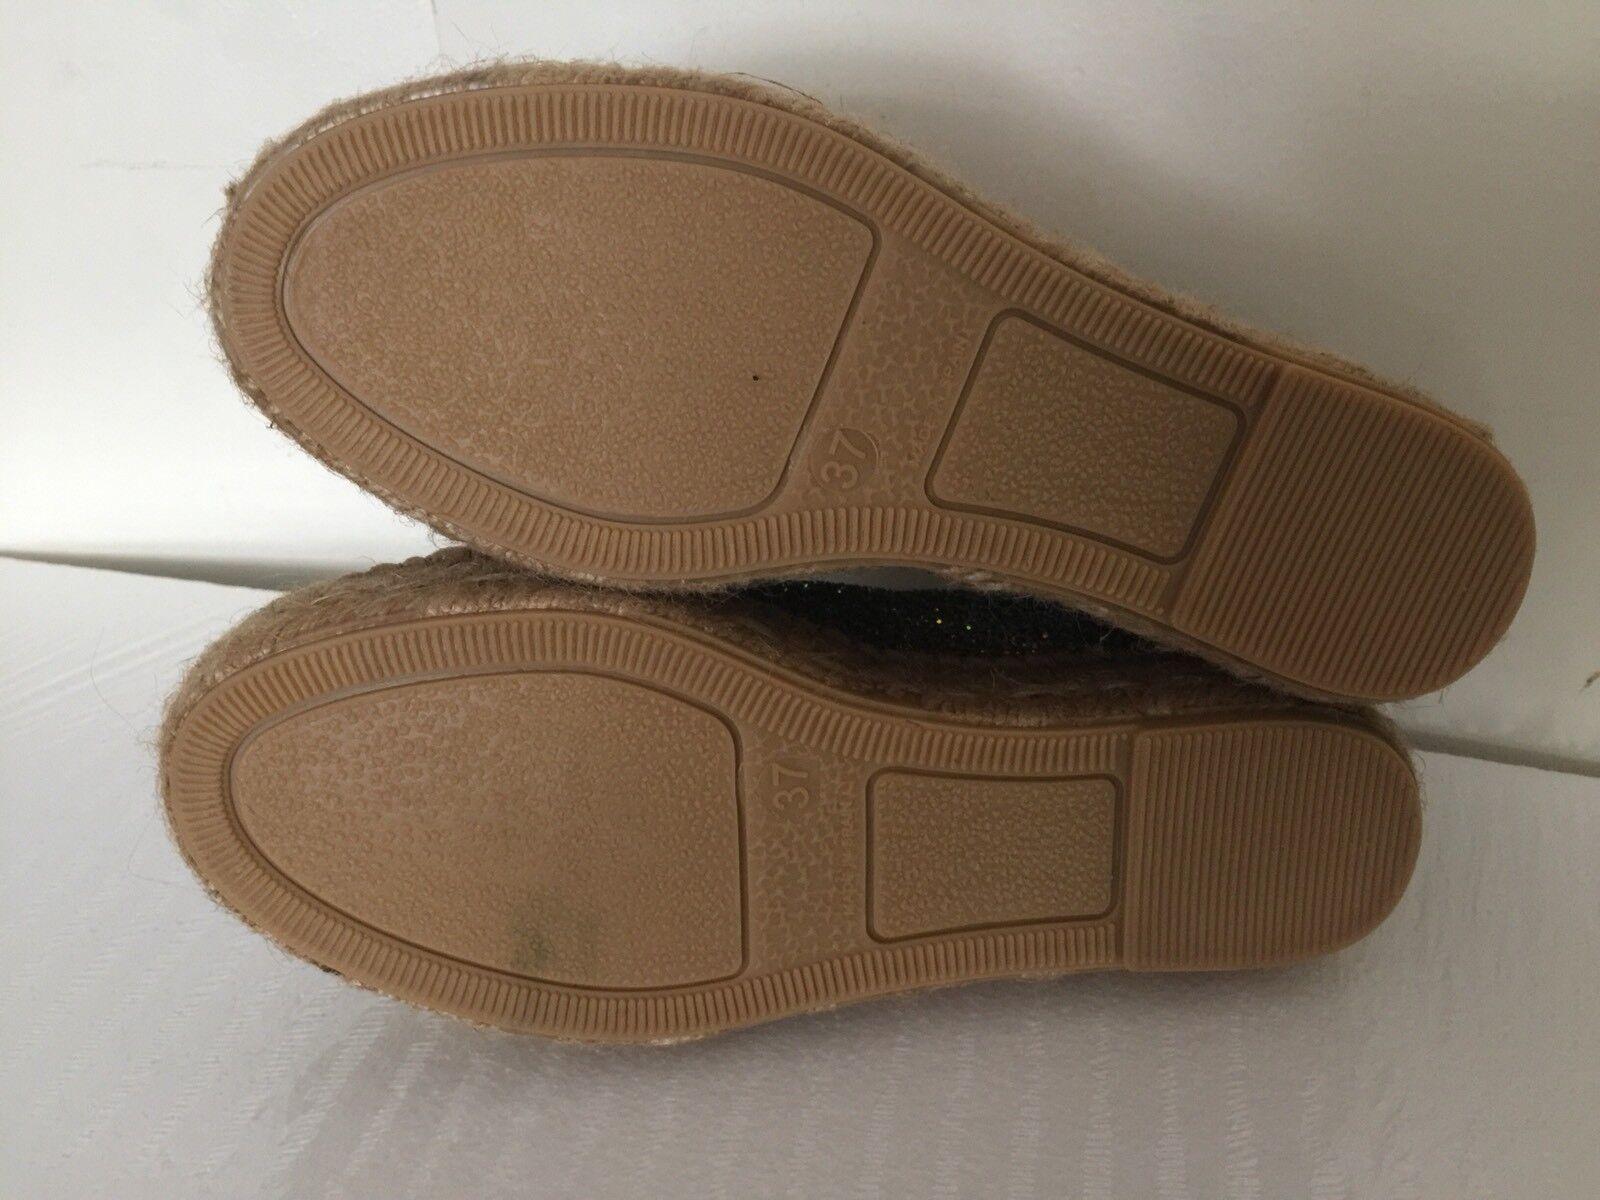 NEW The scarpe Box Glitter Platform Espadrilles Sz 37 6.5 6.5 6.5 Rainbow rosa scarpe da ginnastica 49d43d